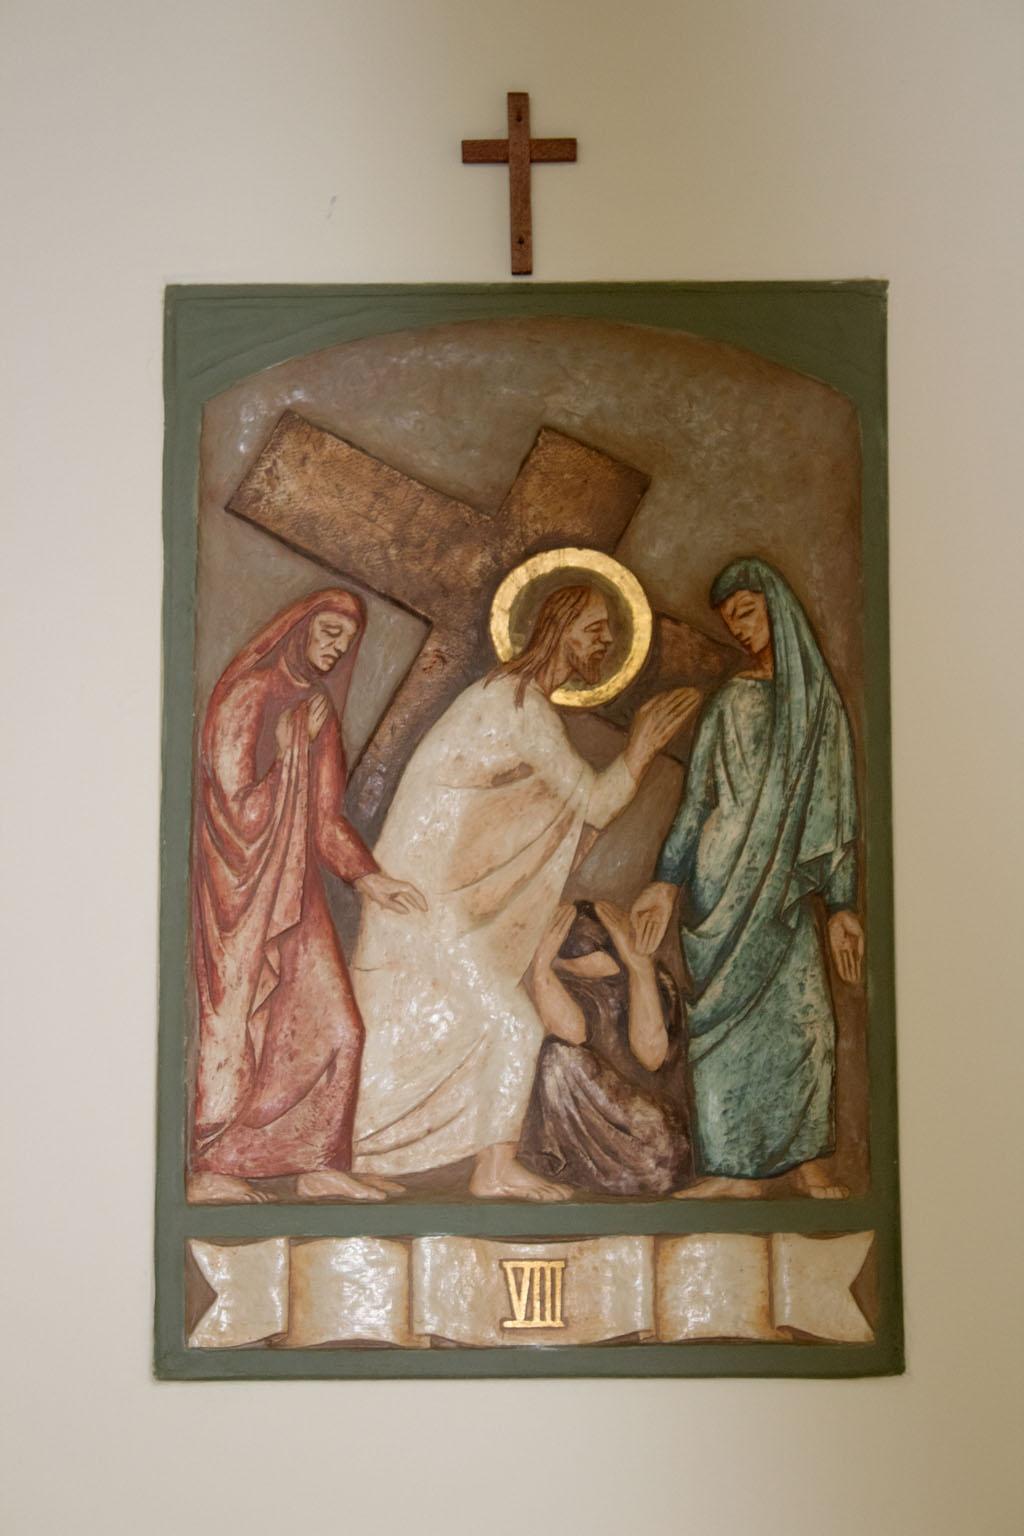 Eighth Station of the cross by Dora de Pédery Hunt